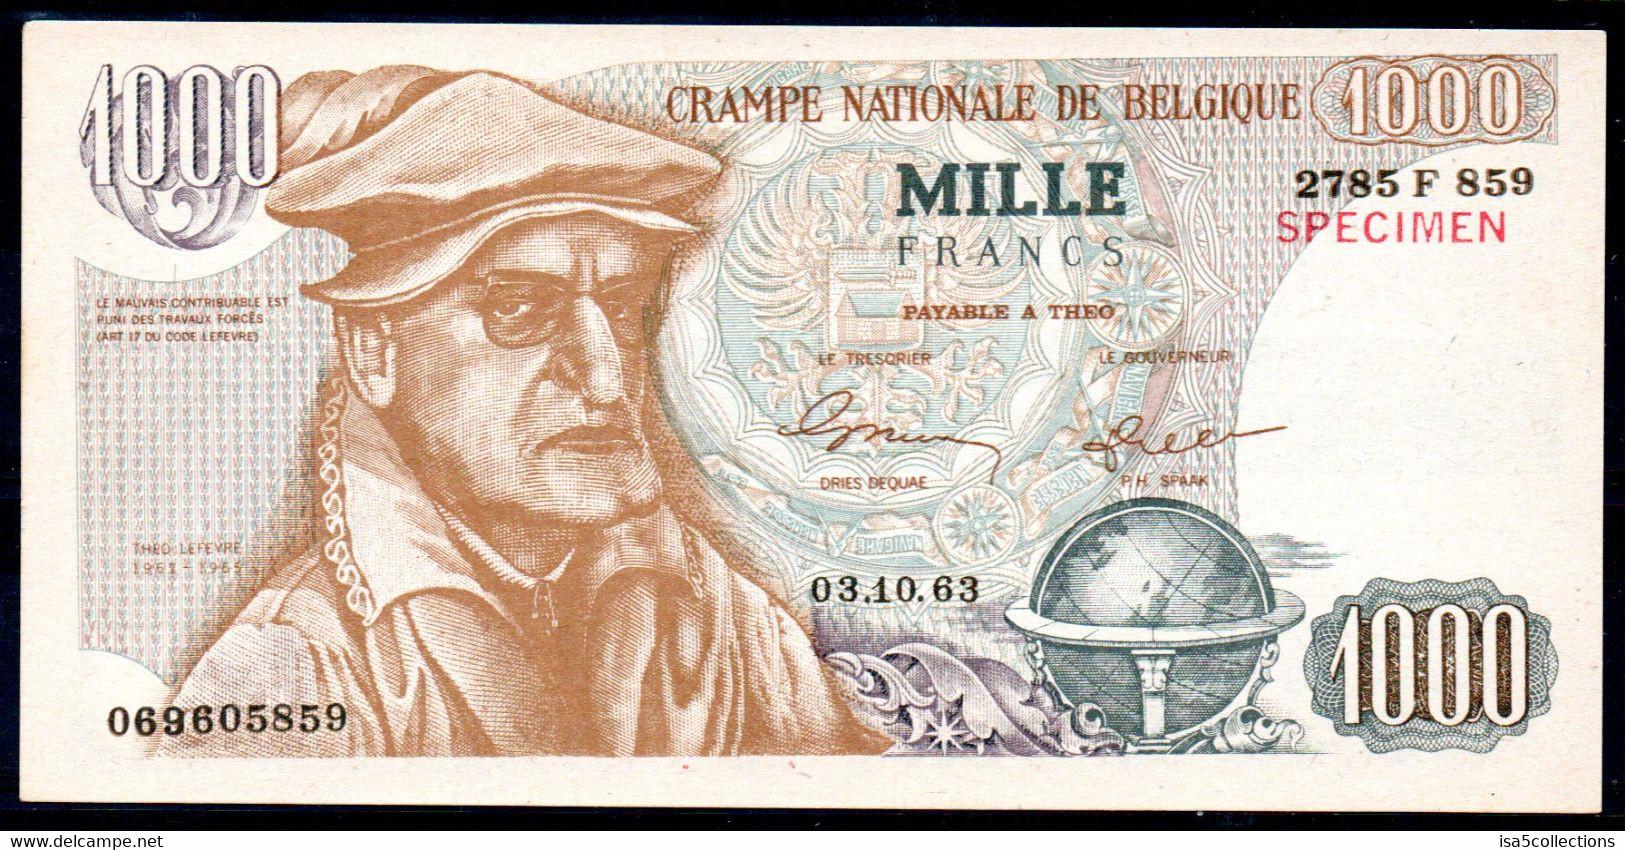 1000 F Crampe Nationale - Tract Electoral PLP De 1963 - [ 8] Fakes & Specimens